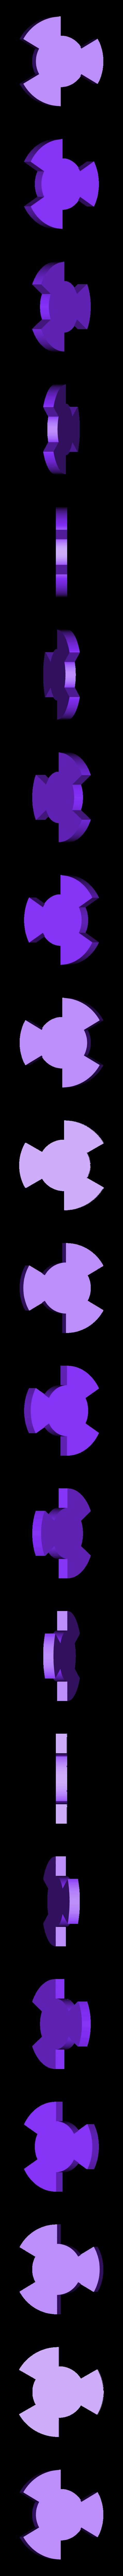 Chip_White.stl Download free STL file Cuphead and Mugman • 3D printing model, ChaosCoreTech